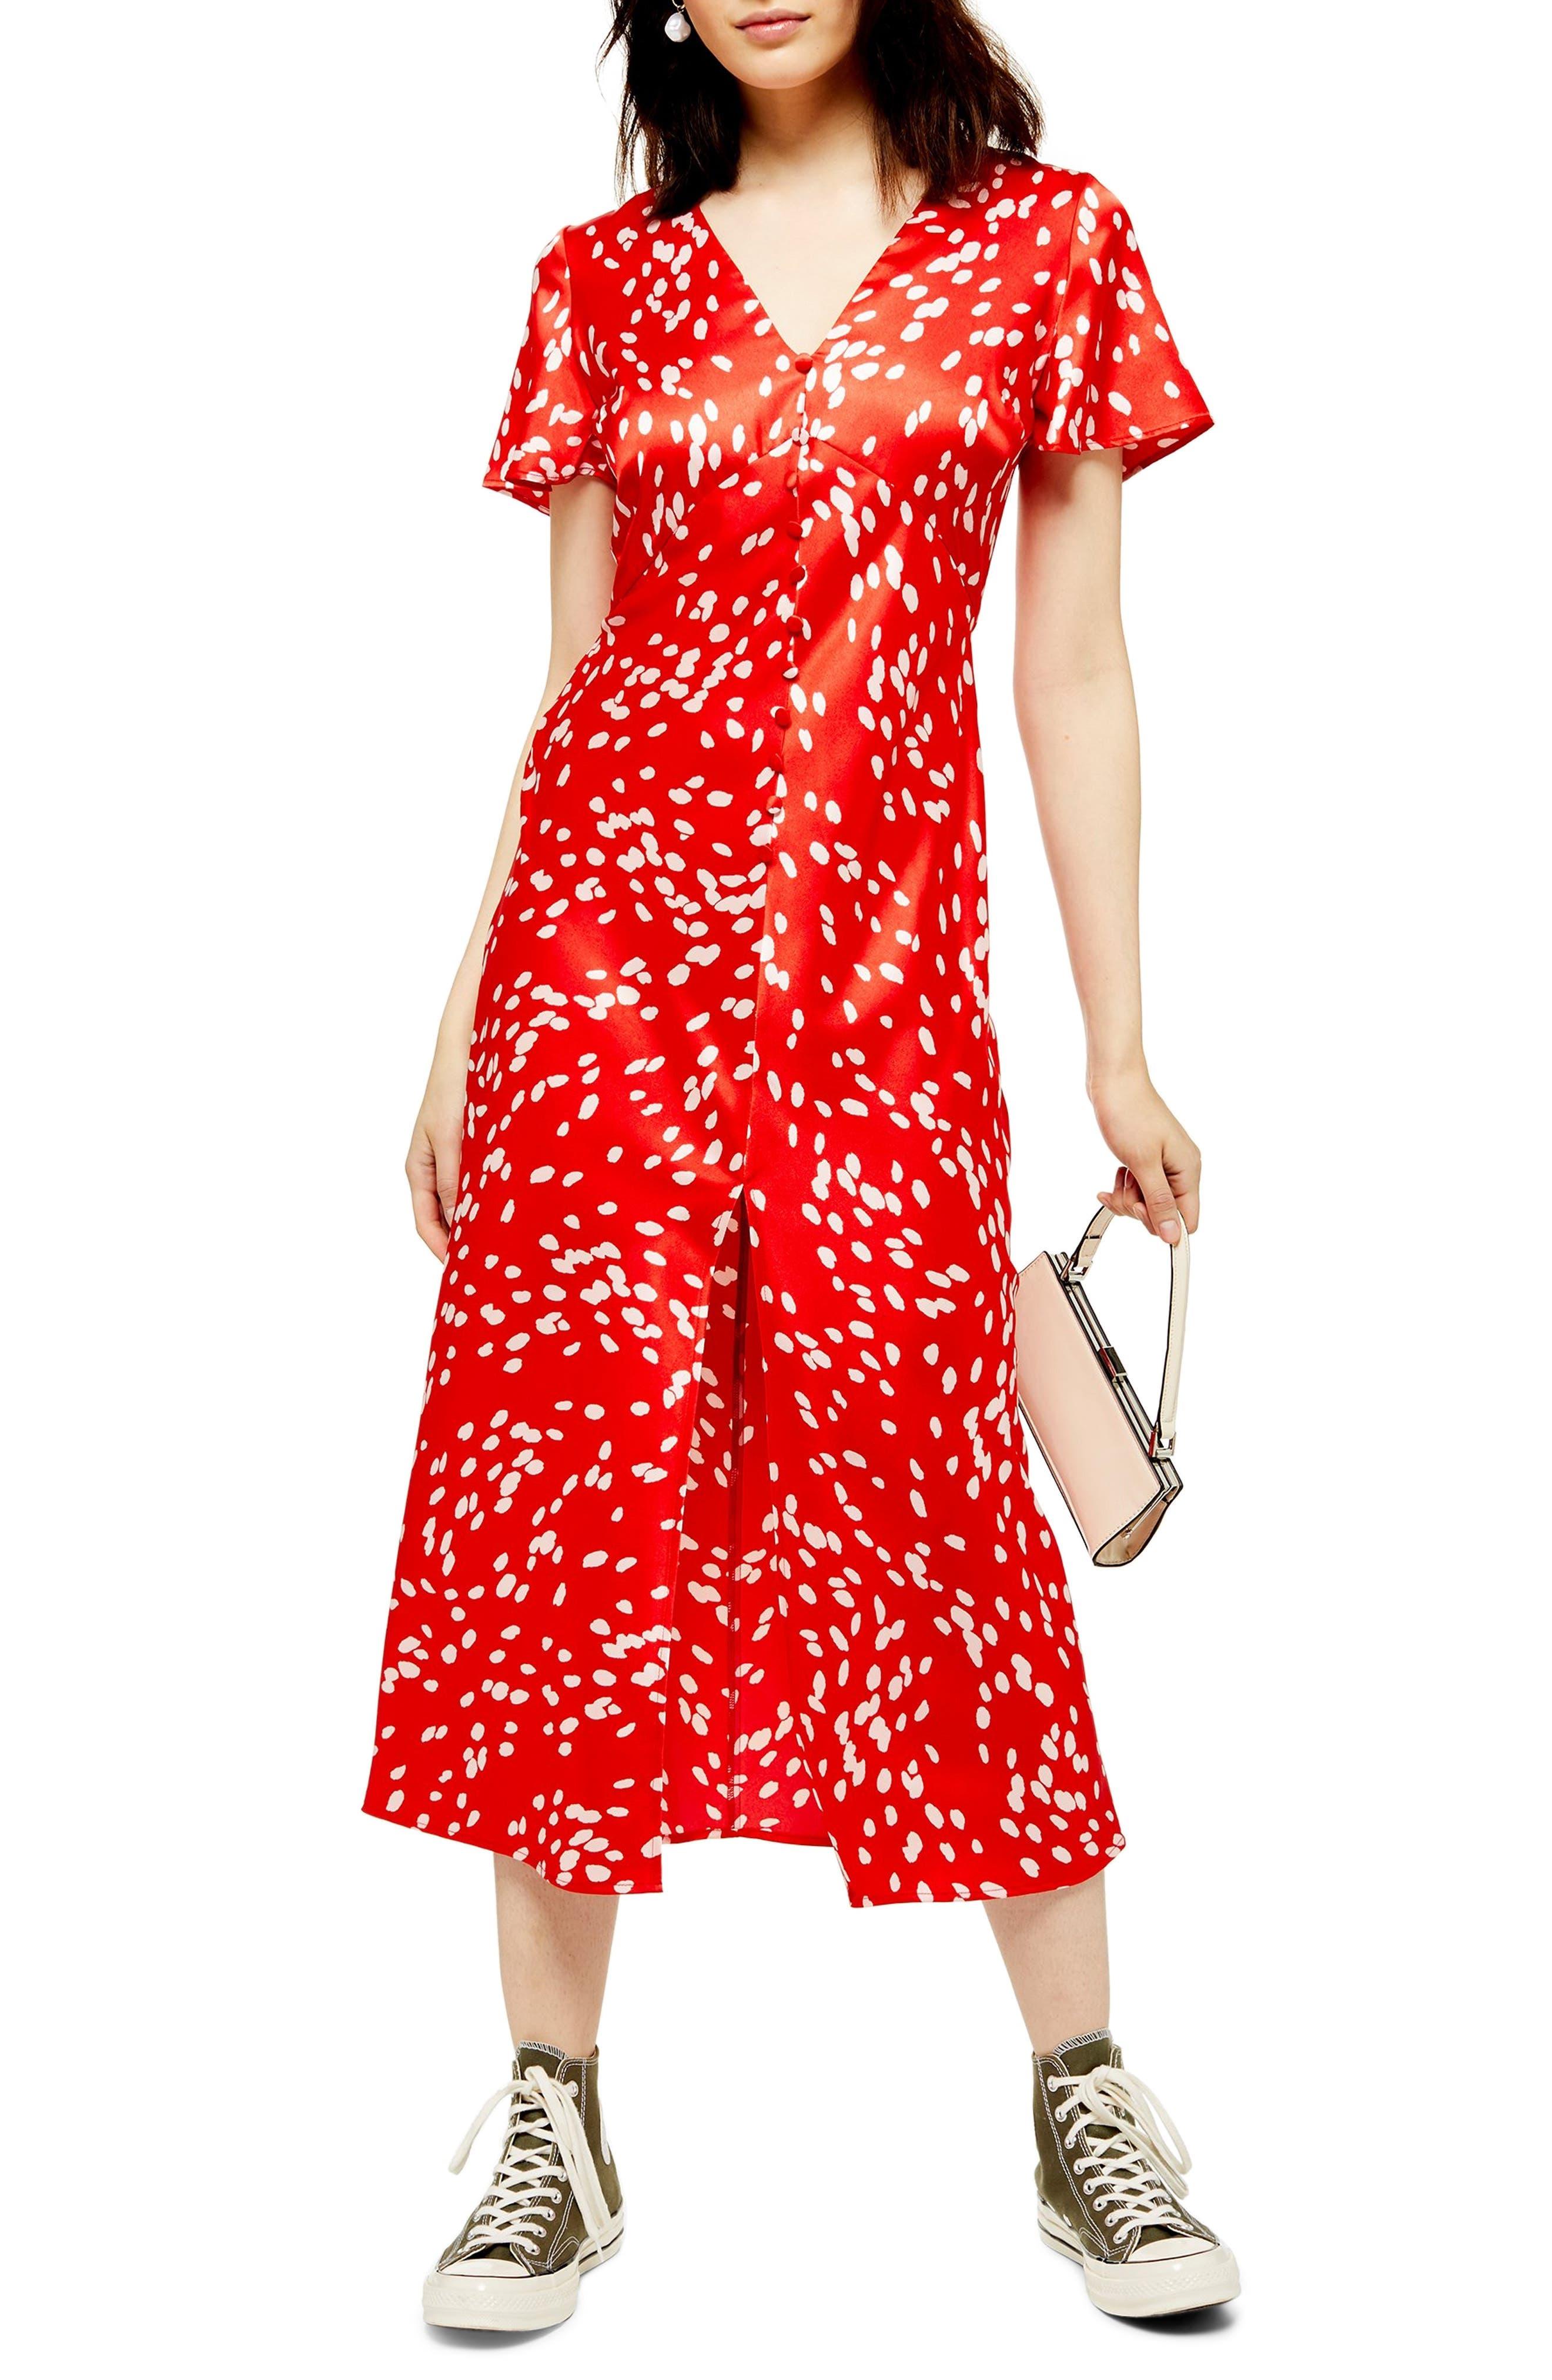 Topshop Polka Dot Midi Dress, US (fits like 0) - Red